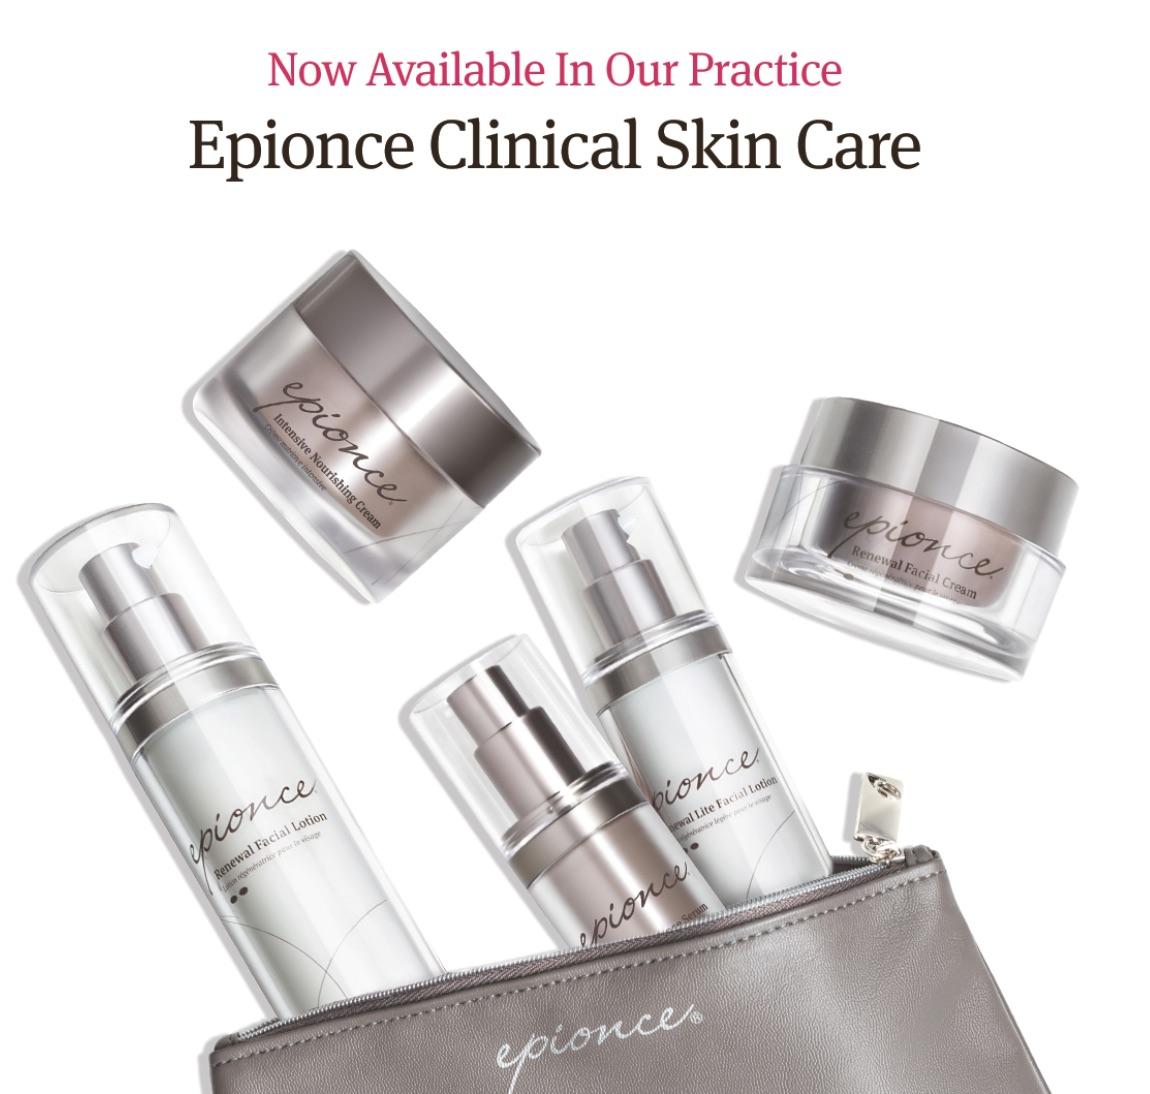 8 Reasons Why We Love Epionce, the Botanically Based Skin Care Line